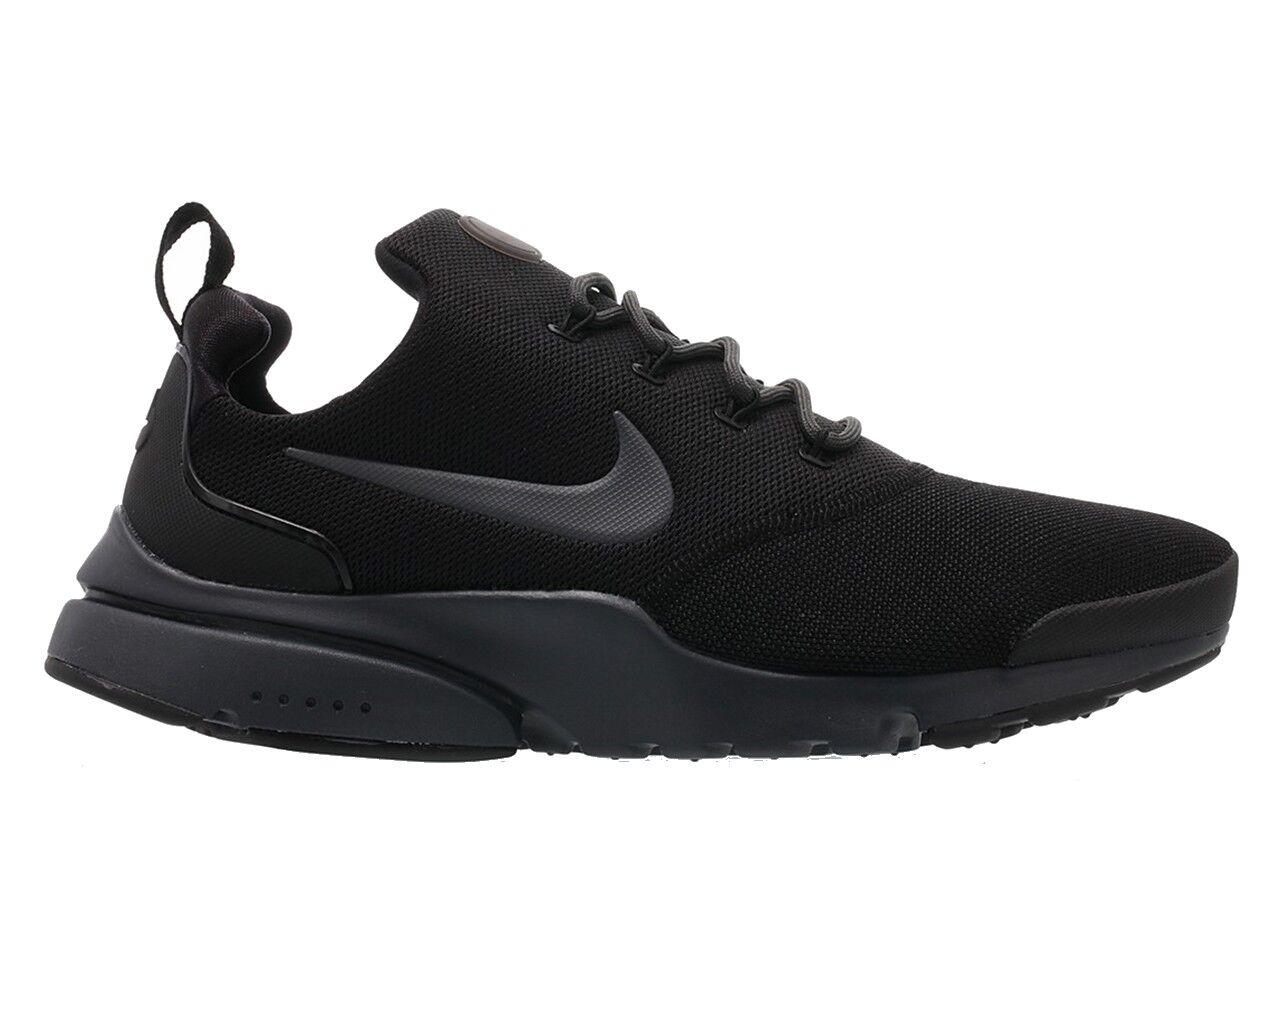 Nike PRESTO FLY 908019 008 Black Grey Mens Trainers